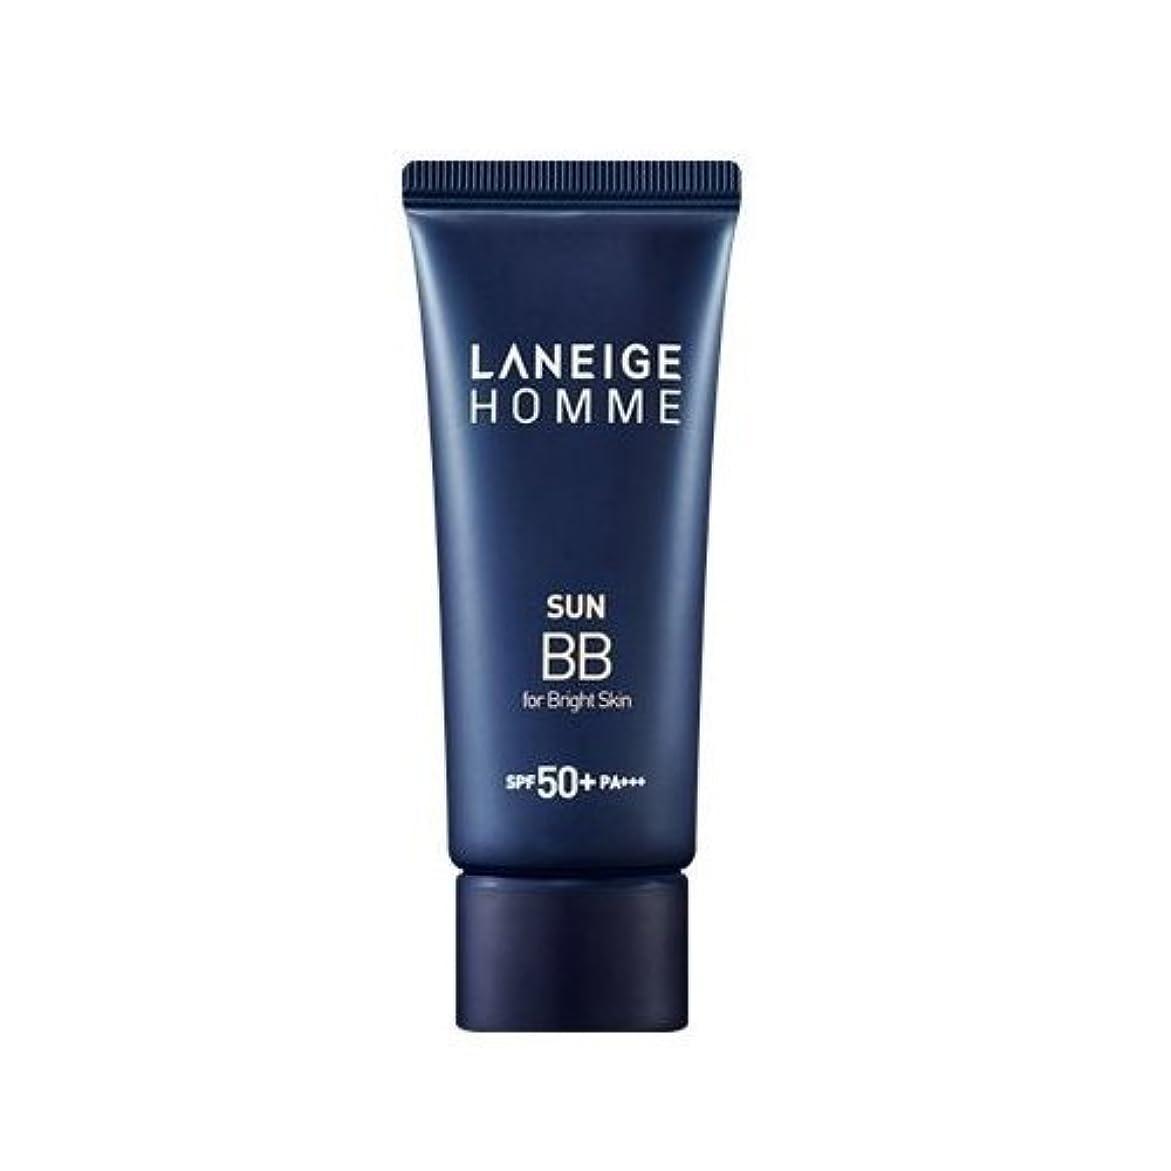 Laneige Homme Sun BB Cream (SPF40/PA++) - #Bright skin